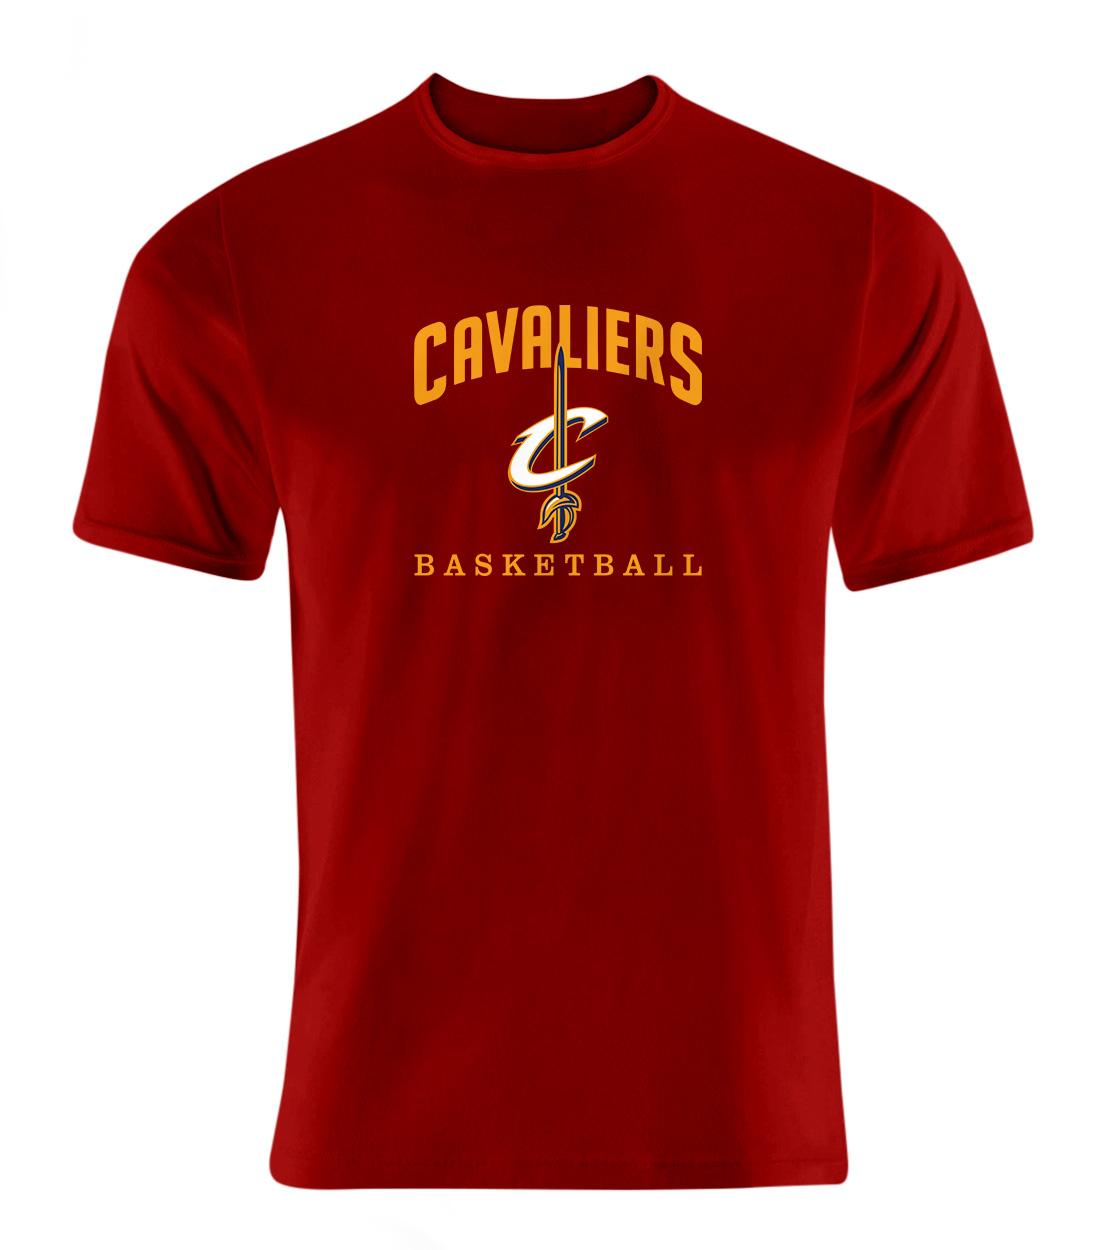 Cleveland Cavaliers Tshirt (TSH-RED-NP-61-NBA-CLE-CAVS.ARCH)